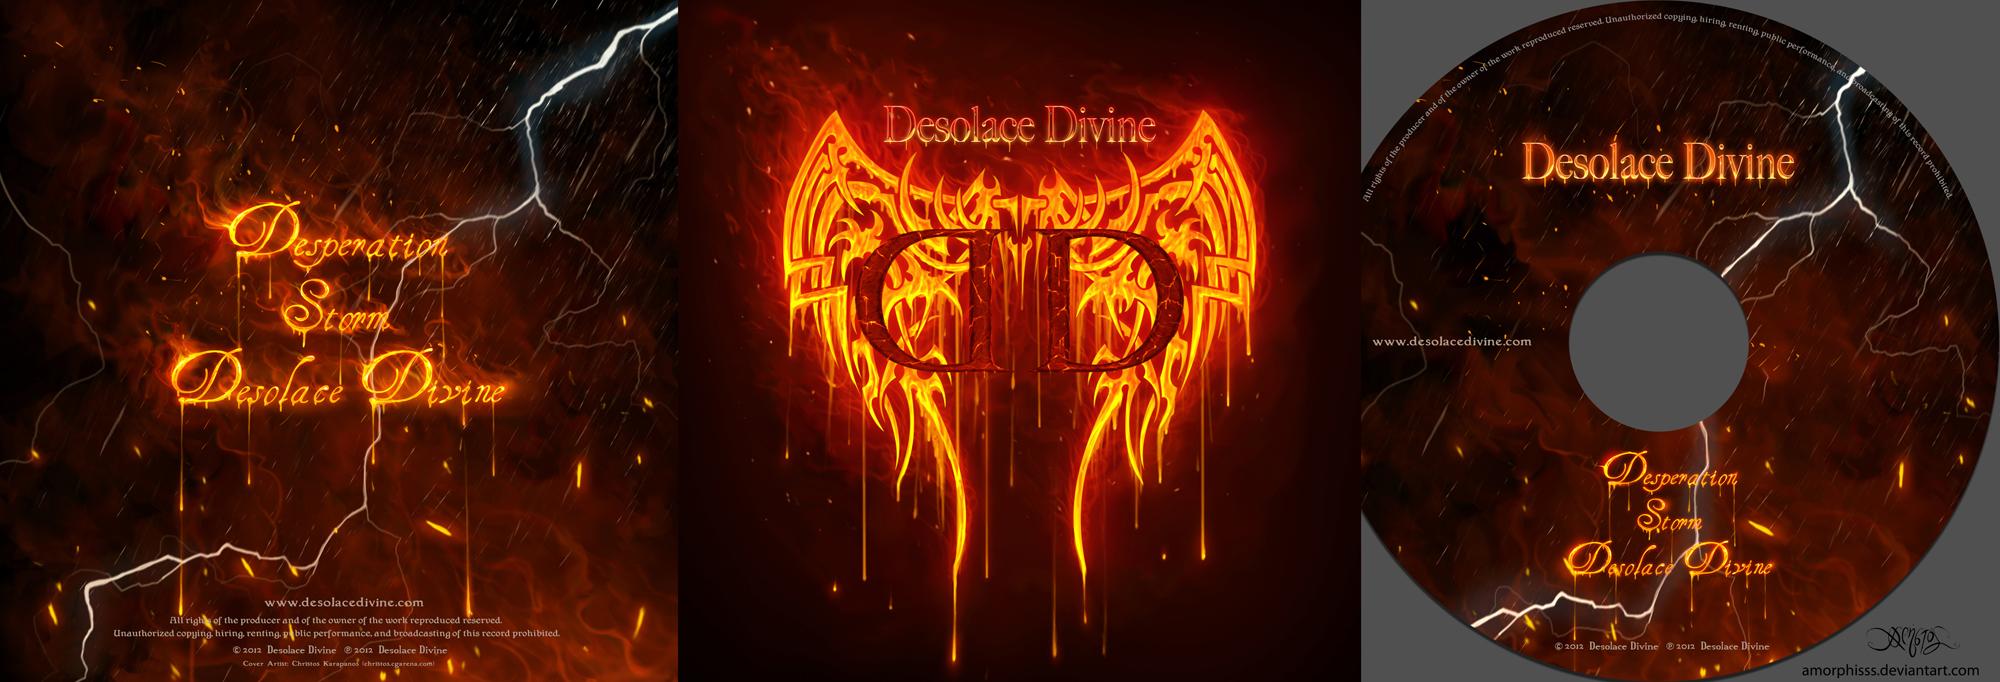 Desolace Divine demo by amorphisss